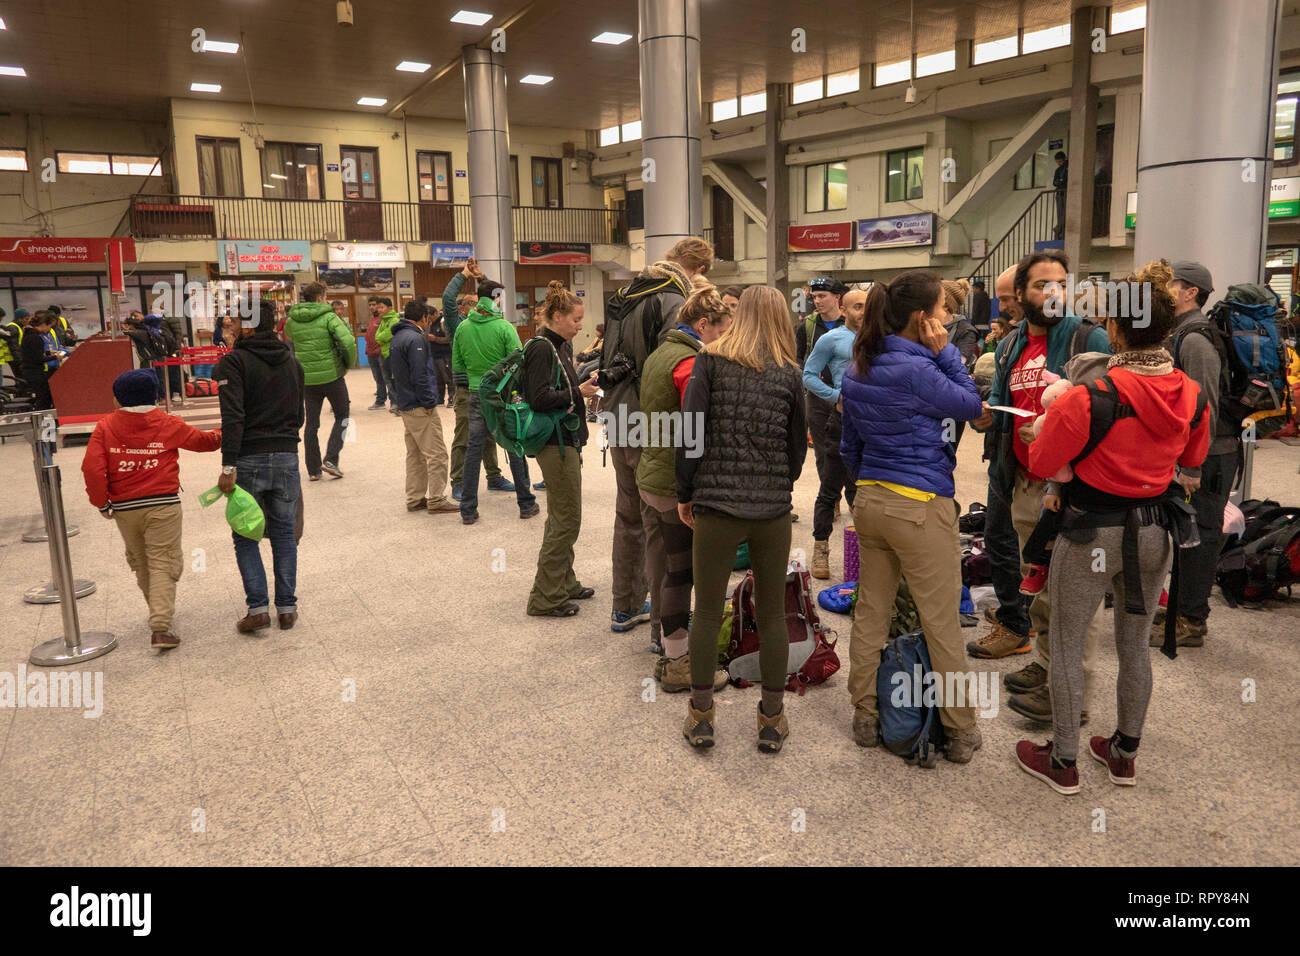 Nepal, Kathmandu, Tribhuvan International airport, domestic departure area, passengers waiting for delayed flights to Lukla - Stock Image